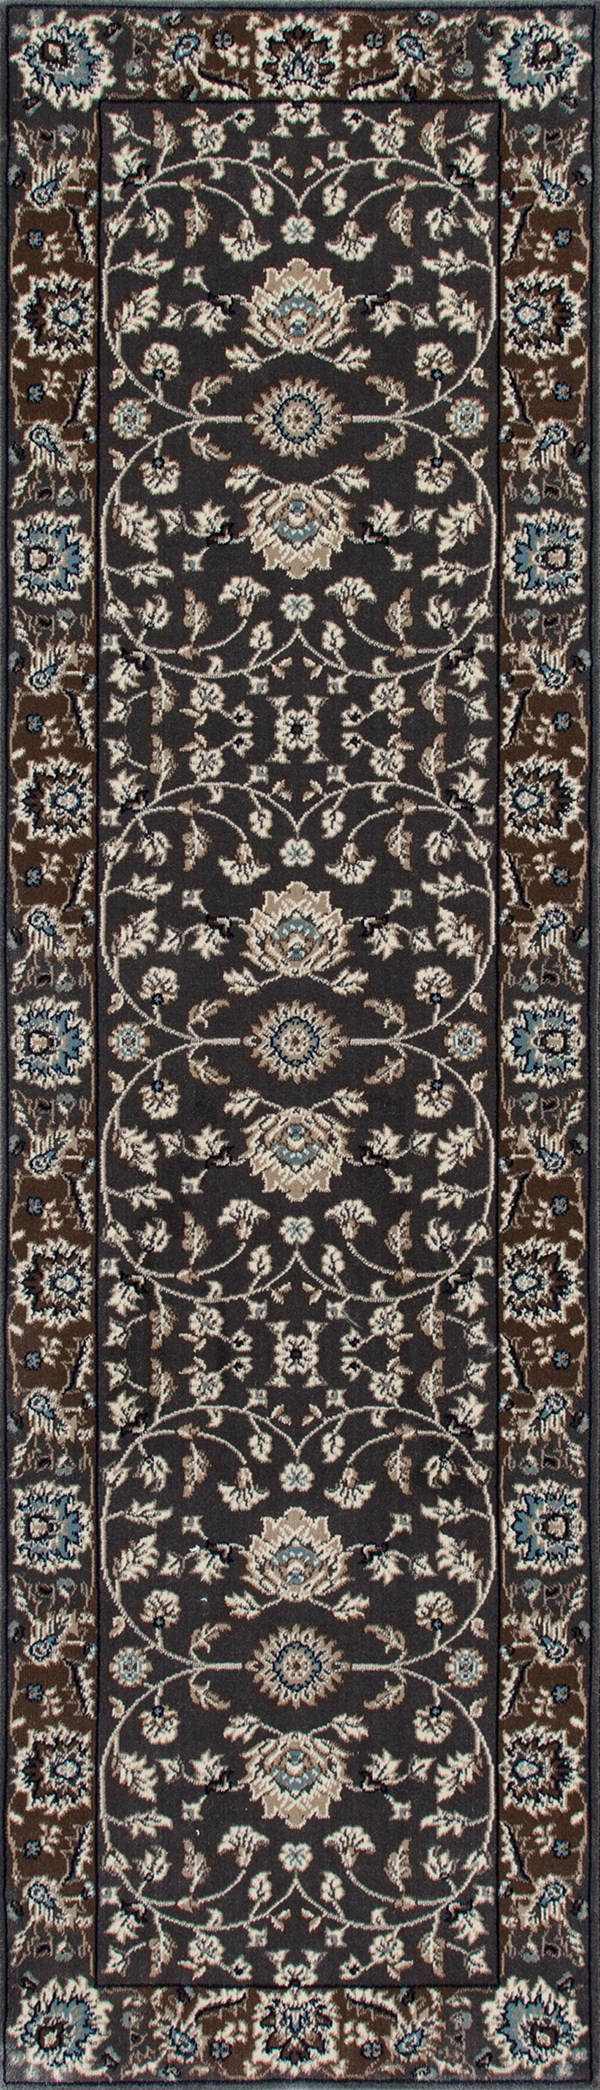 Gray, Cream, Mushroom (AR-065) Traditional / Oriental Area Rug